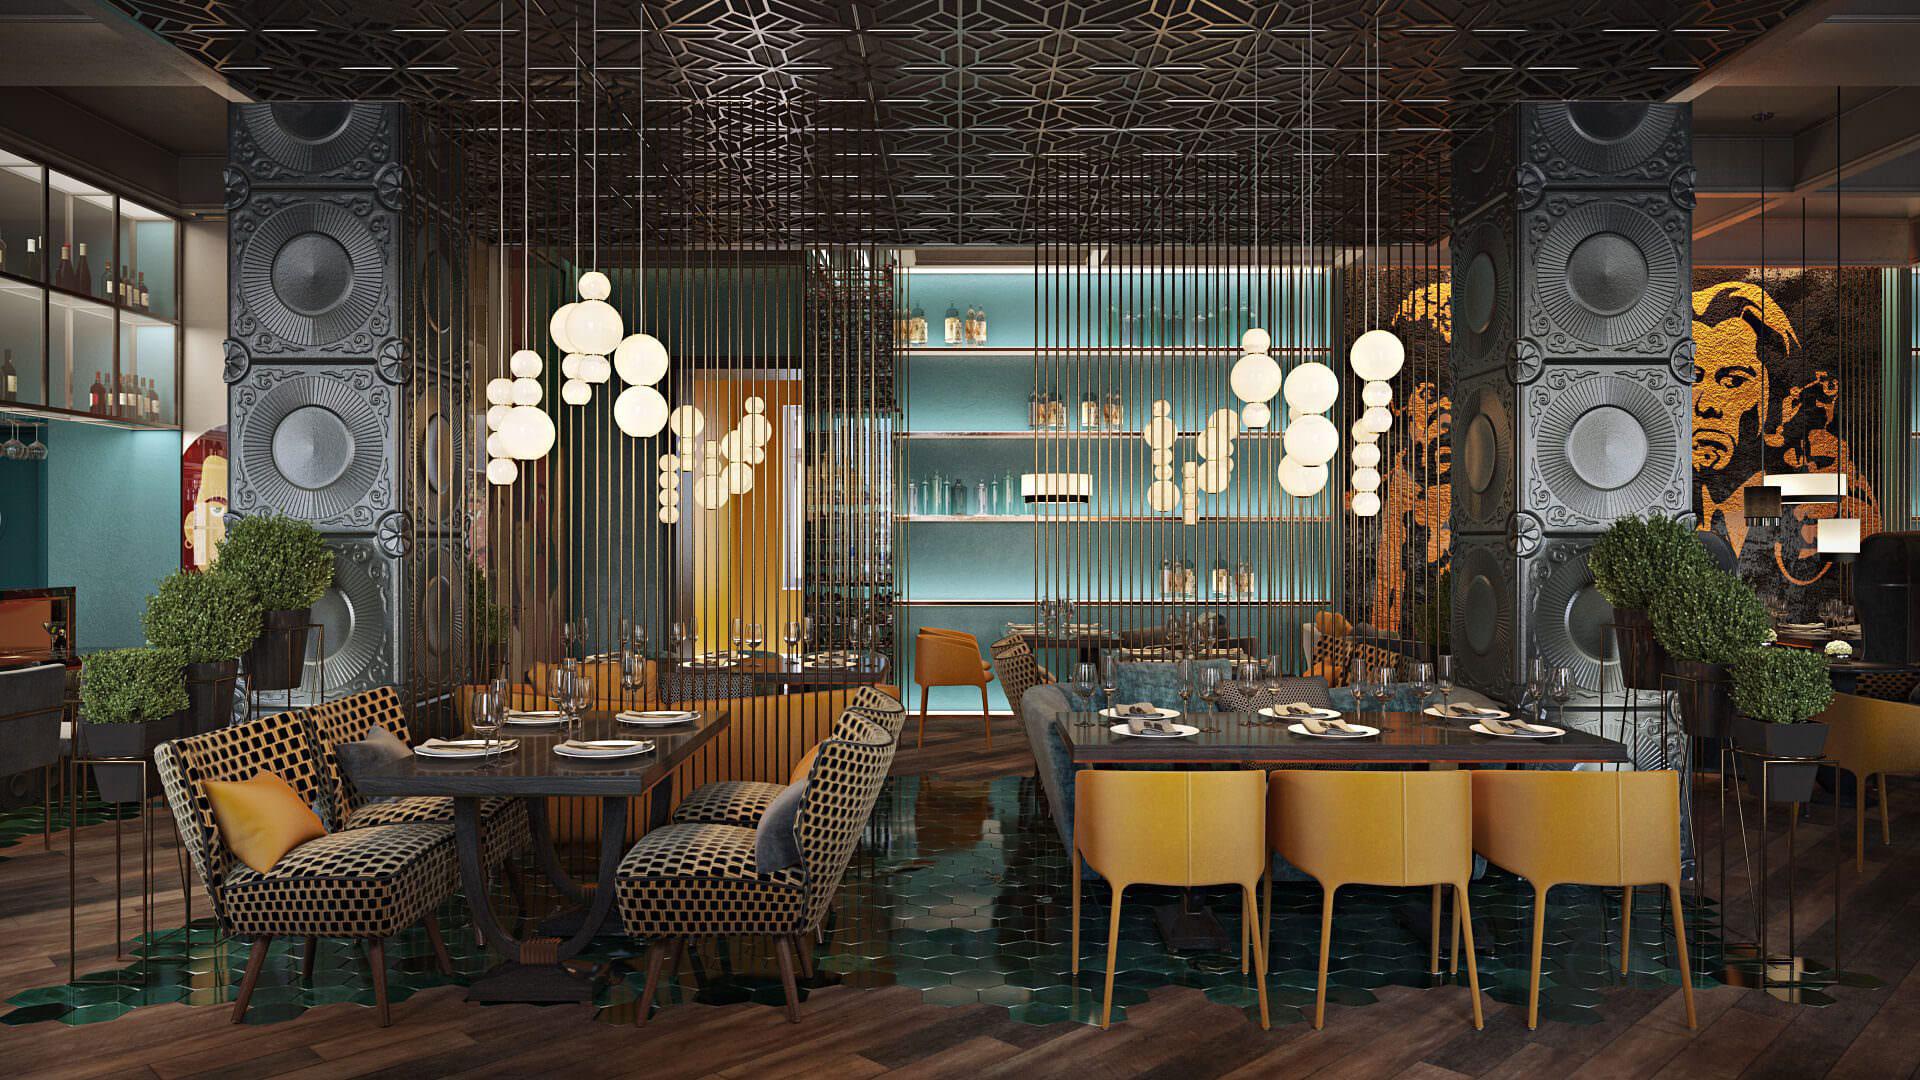 3D Virtually Photographed Interior of a Restaurant Interior